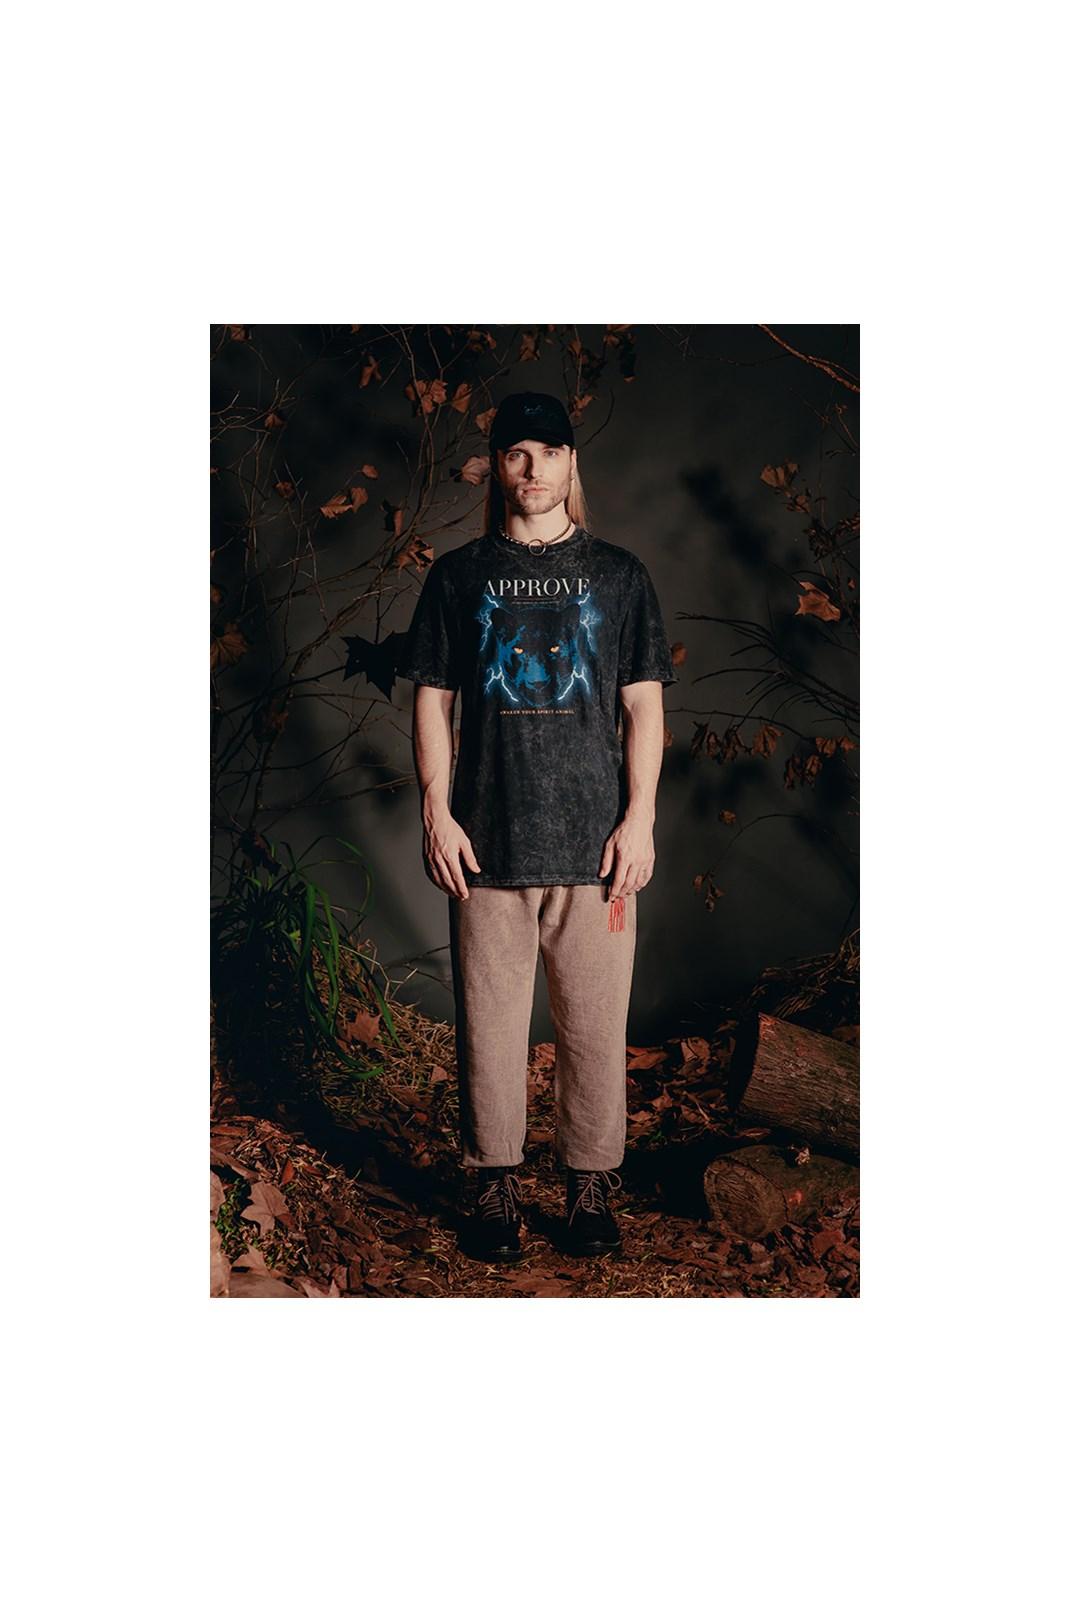 Camiseta Bold Approve Animals Panther Preto Marmorizado